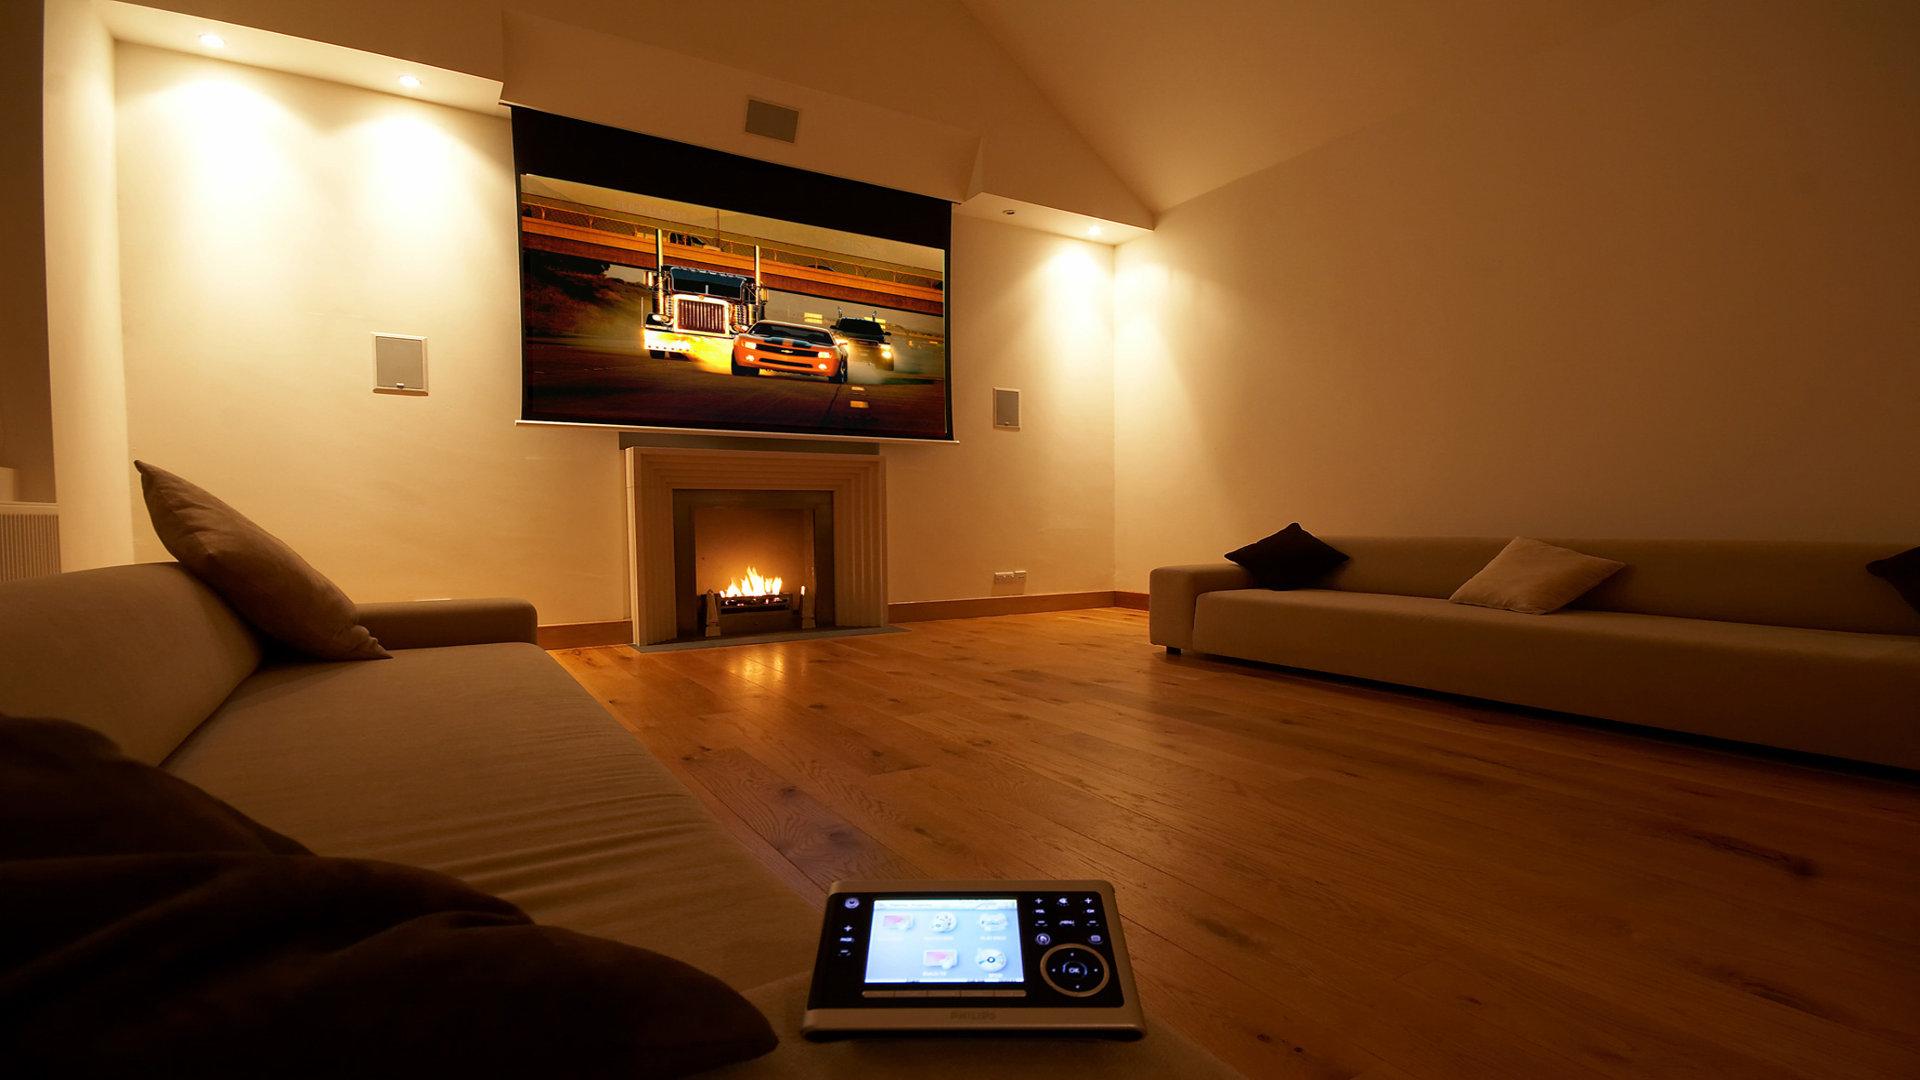 Home theater wallpaper wallpapersafari for Home wallpaper view